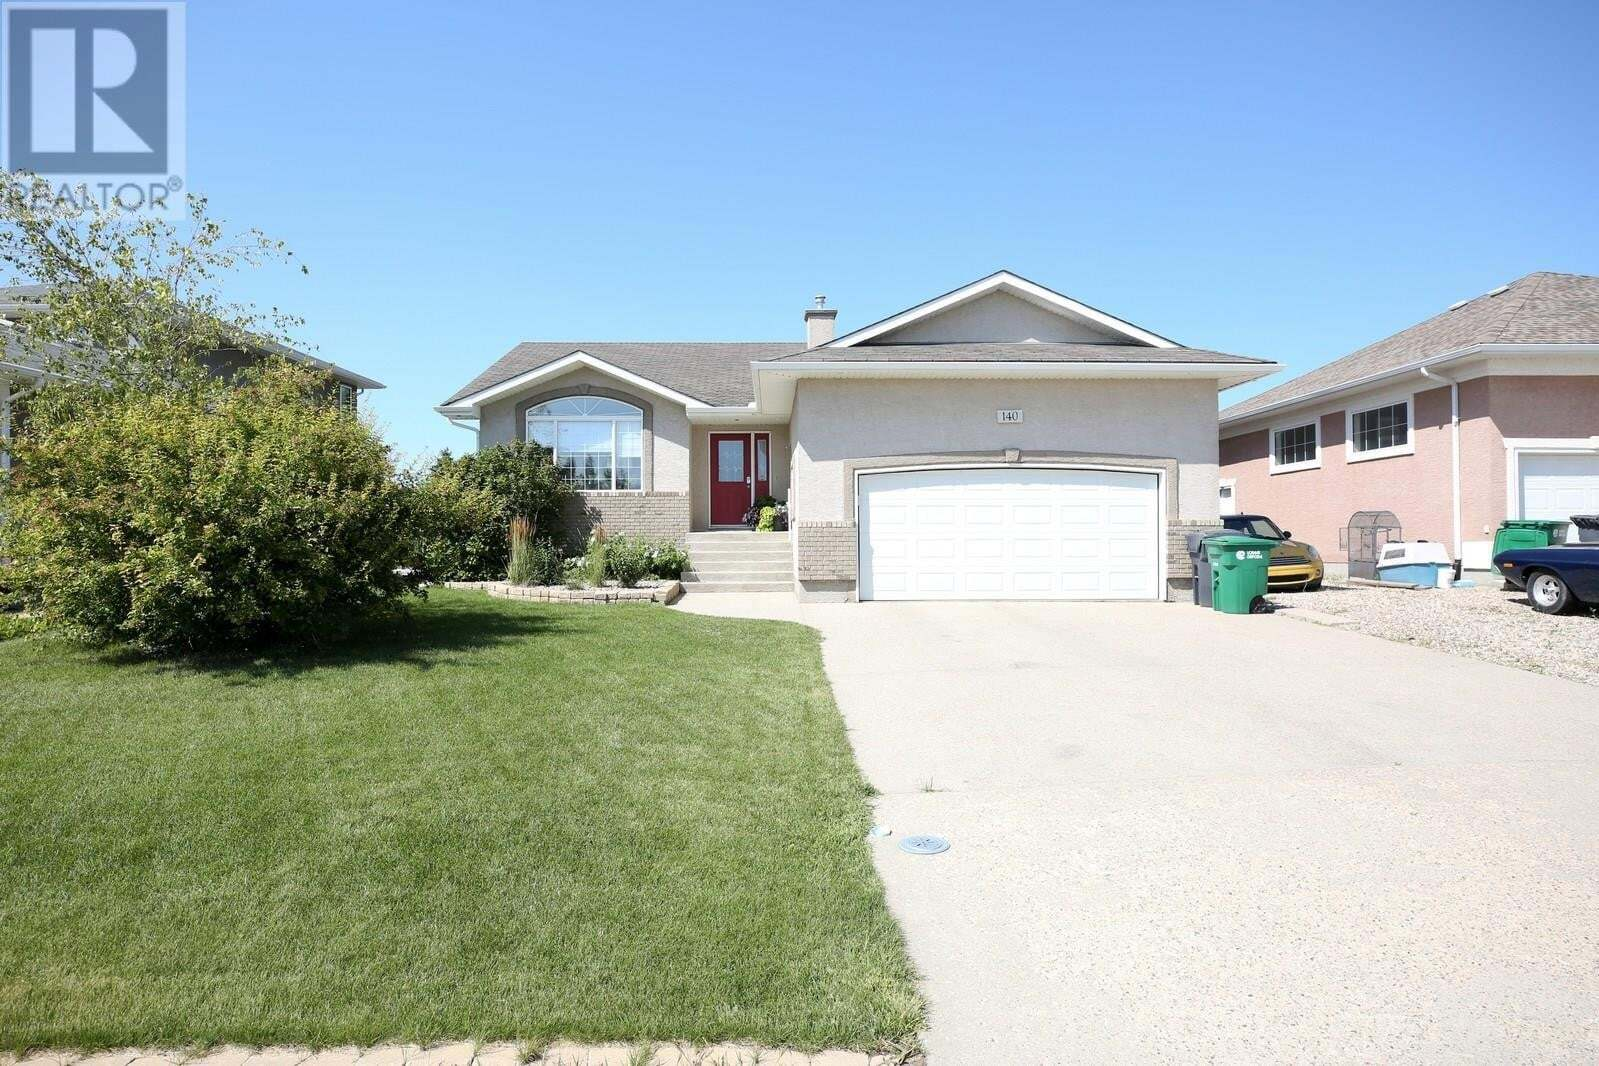 House for sale at 140 Fairway Rd Emerald Park Saskatchewan - MLS: SK814380